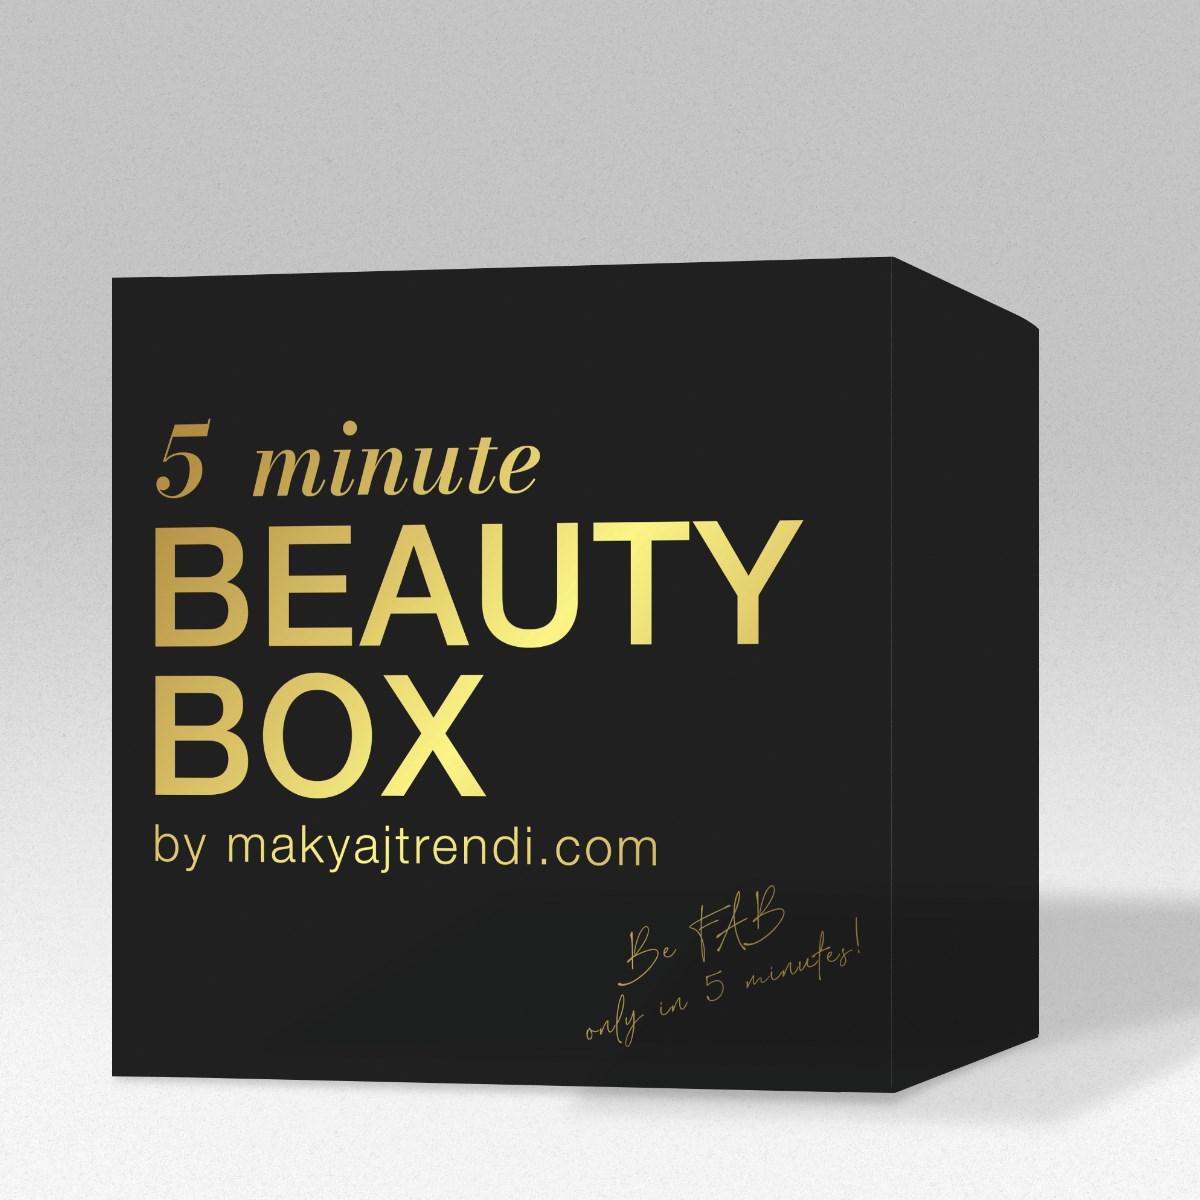 5 MINUTE BEAUTY BOX - OIL FREE 3